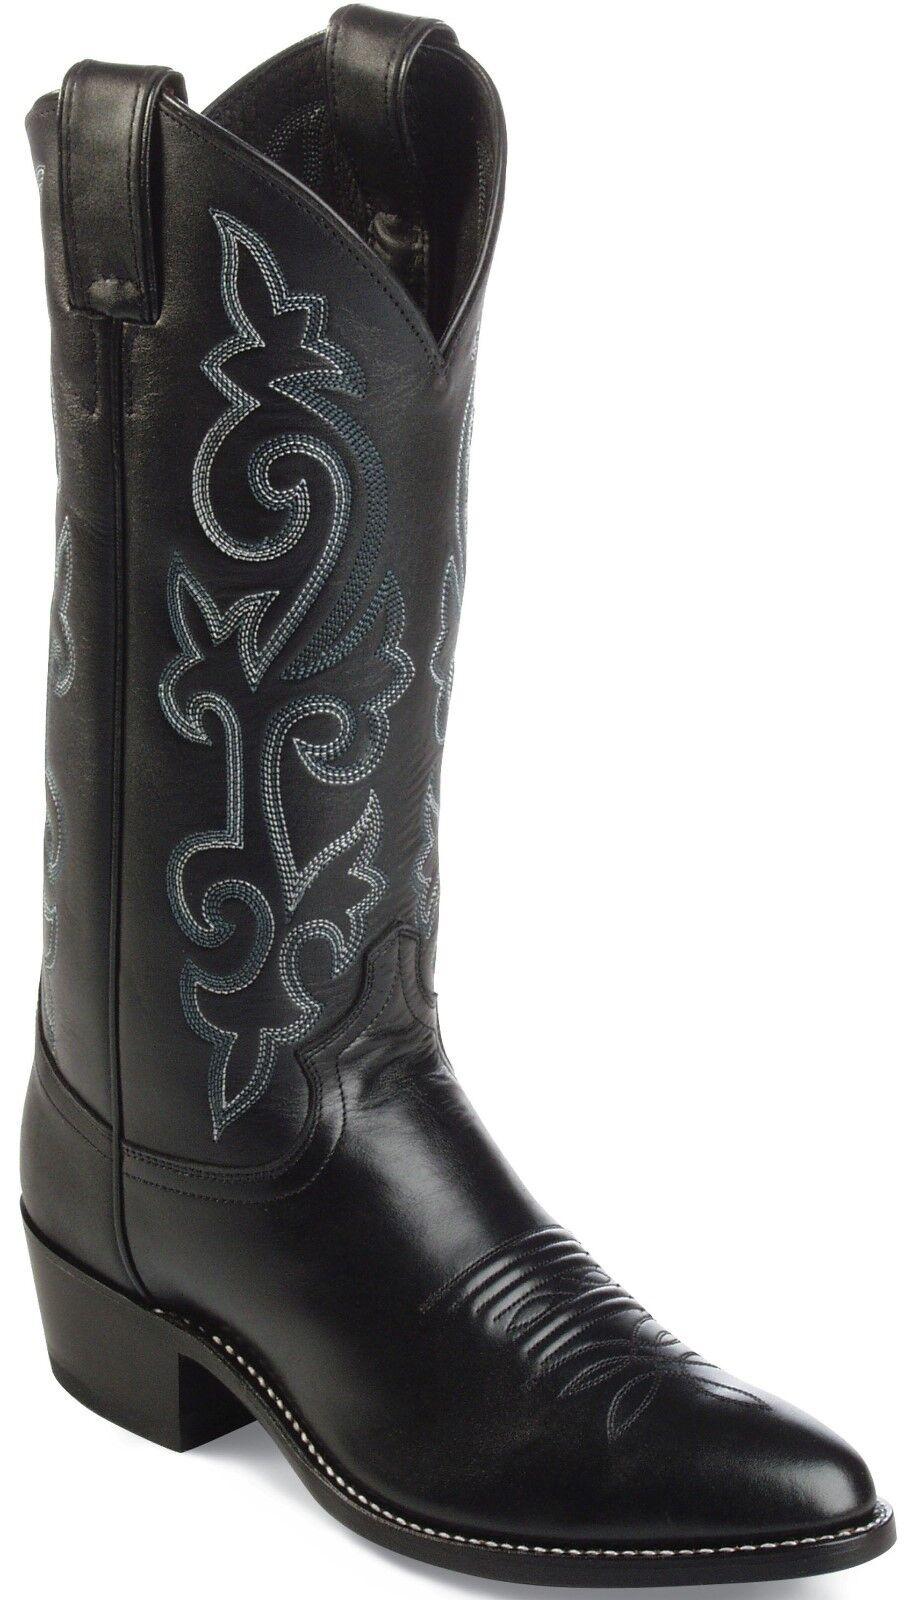 Justin Classic Men's Buck Black Western Cowboy Boot R Toe - 1409